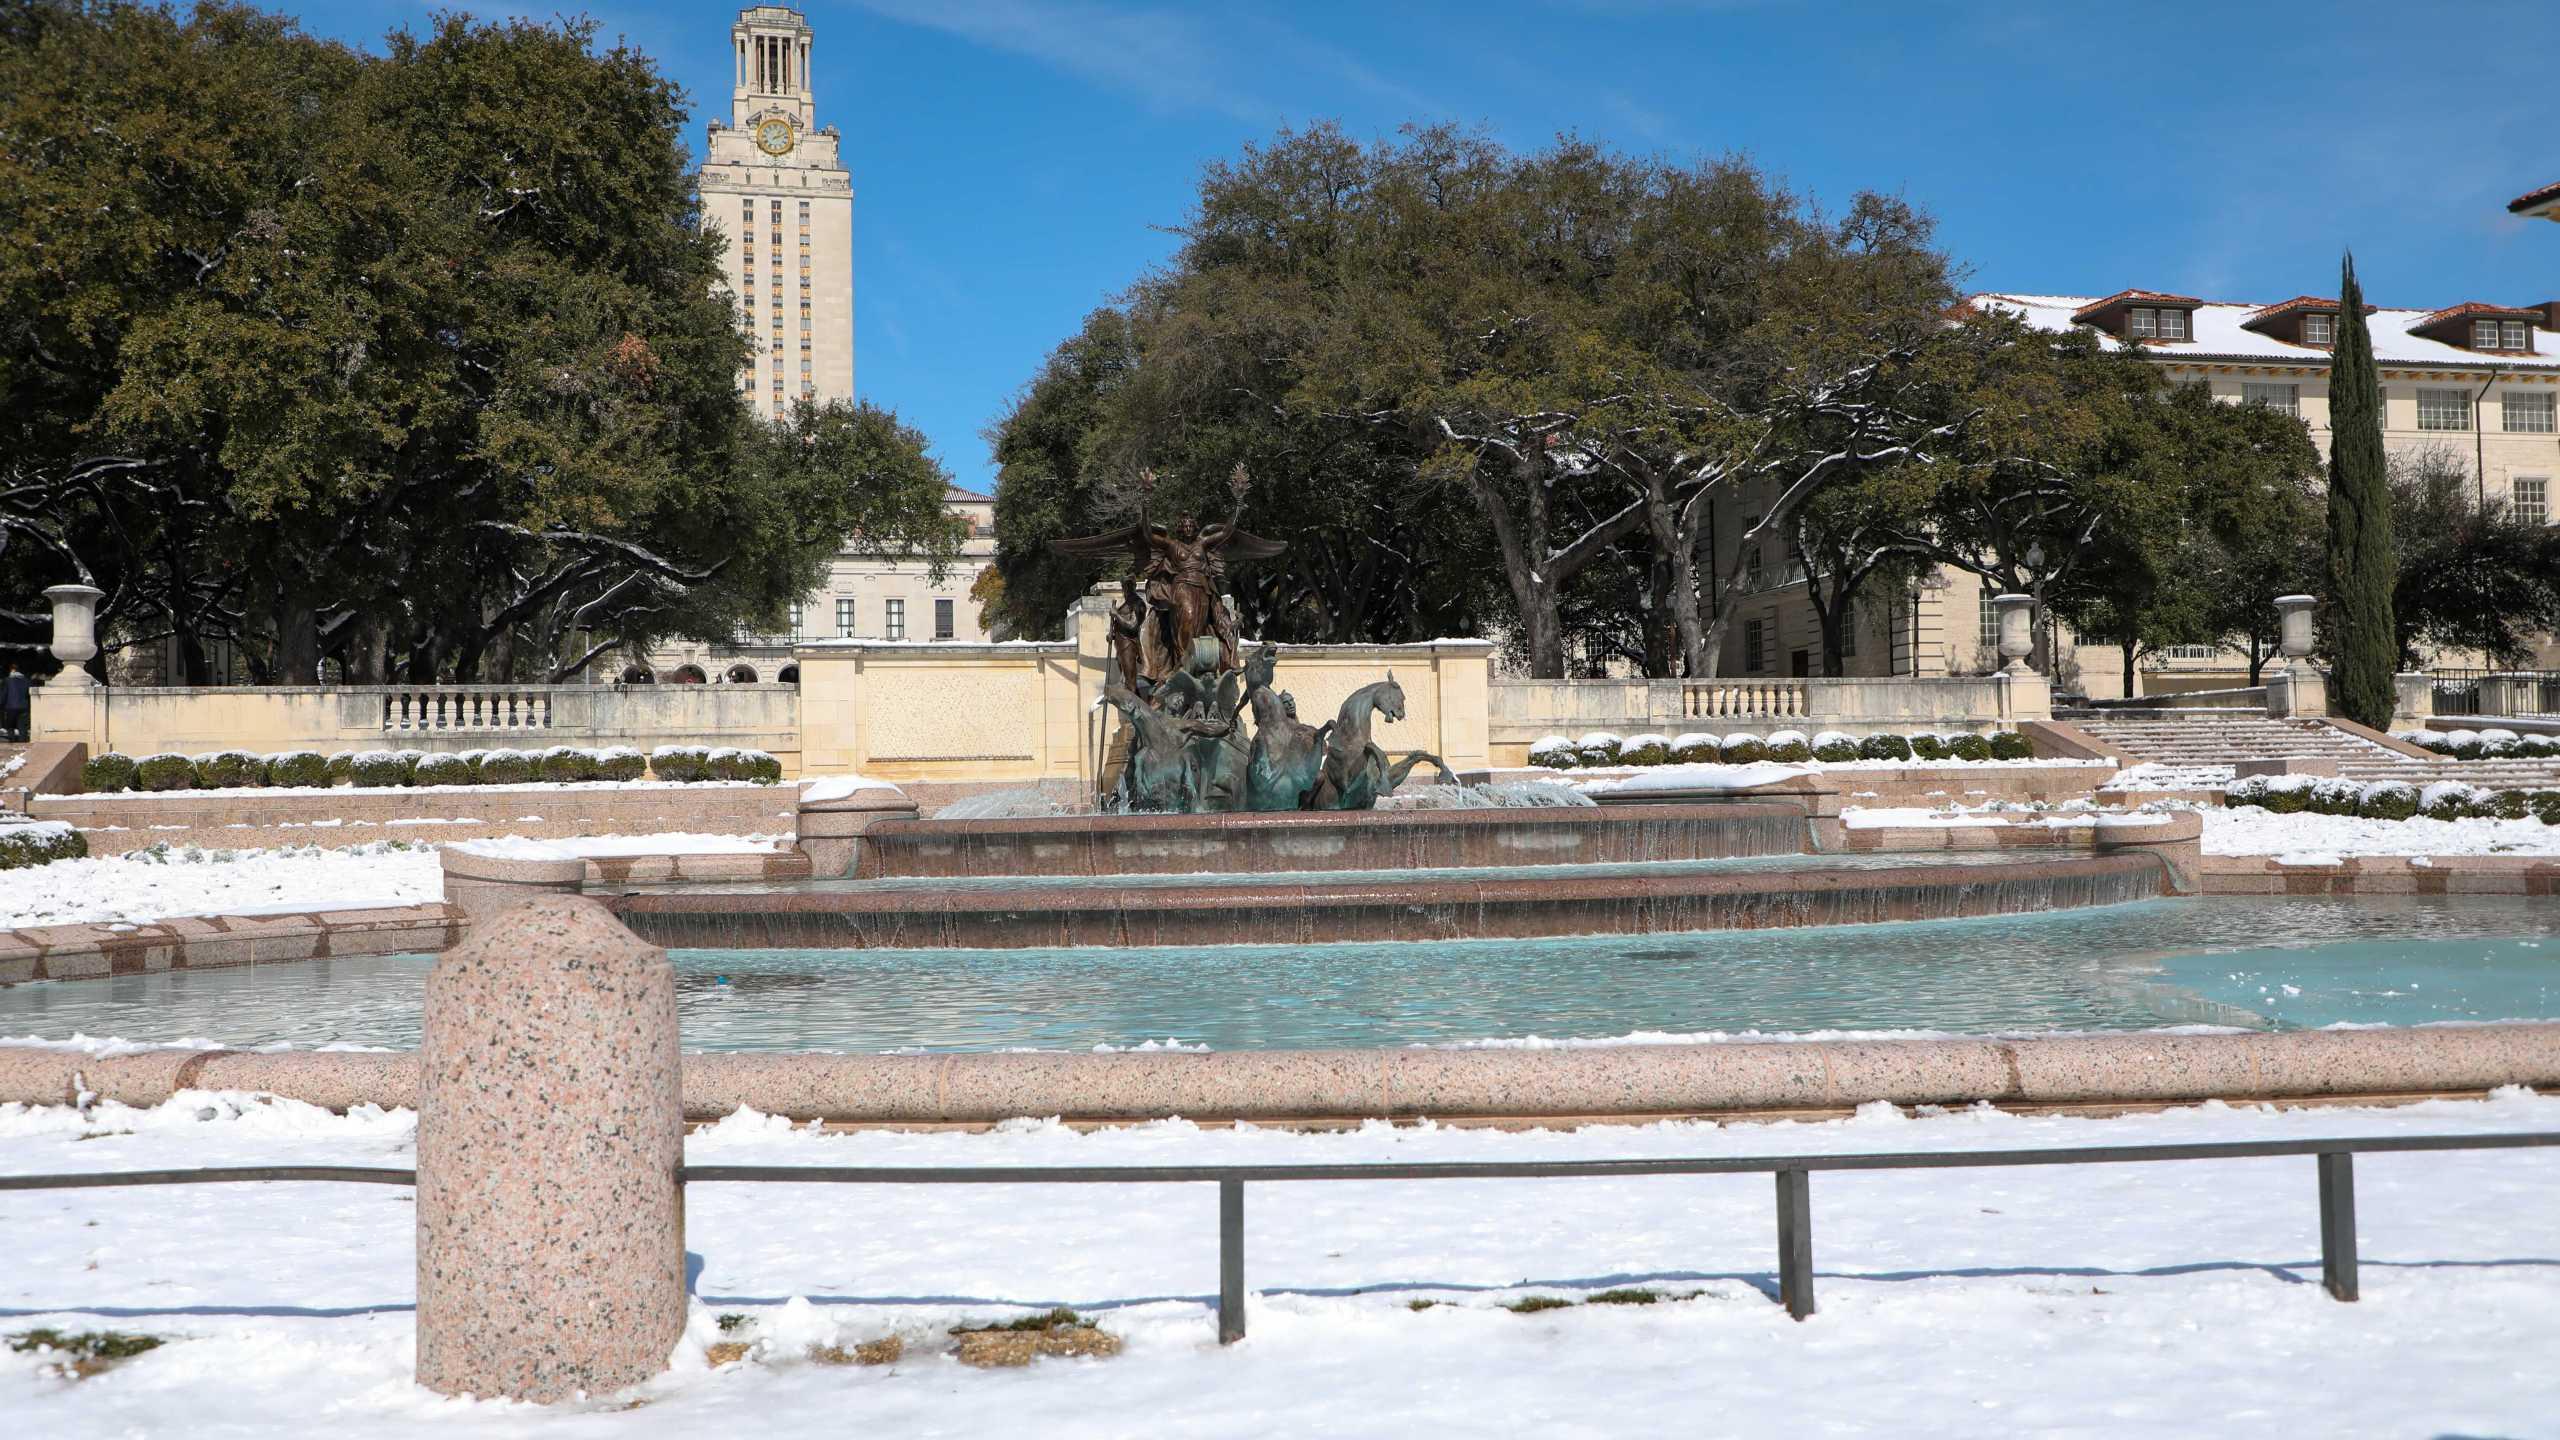 University of Texas at Austin Feb. 17, 2021 (Photo: Ashley Miznazi)